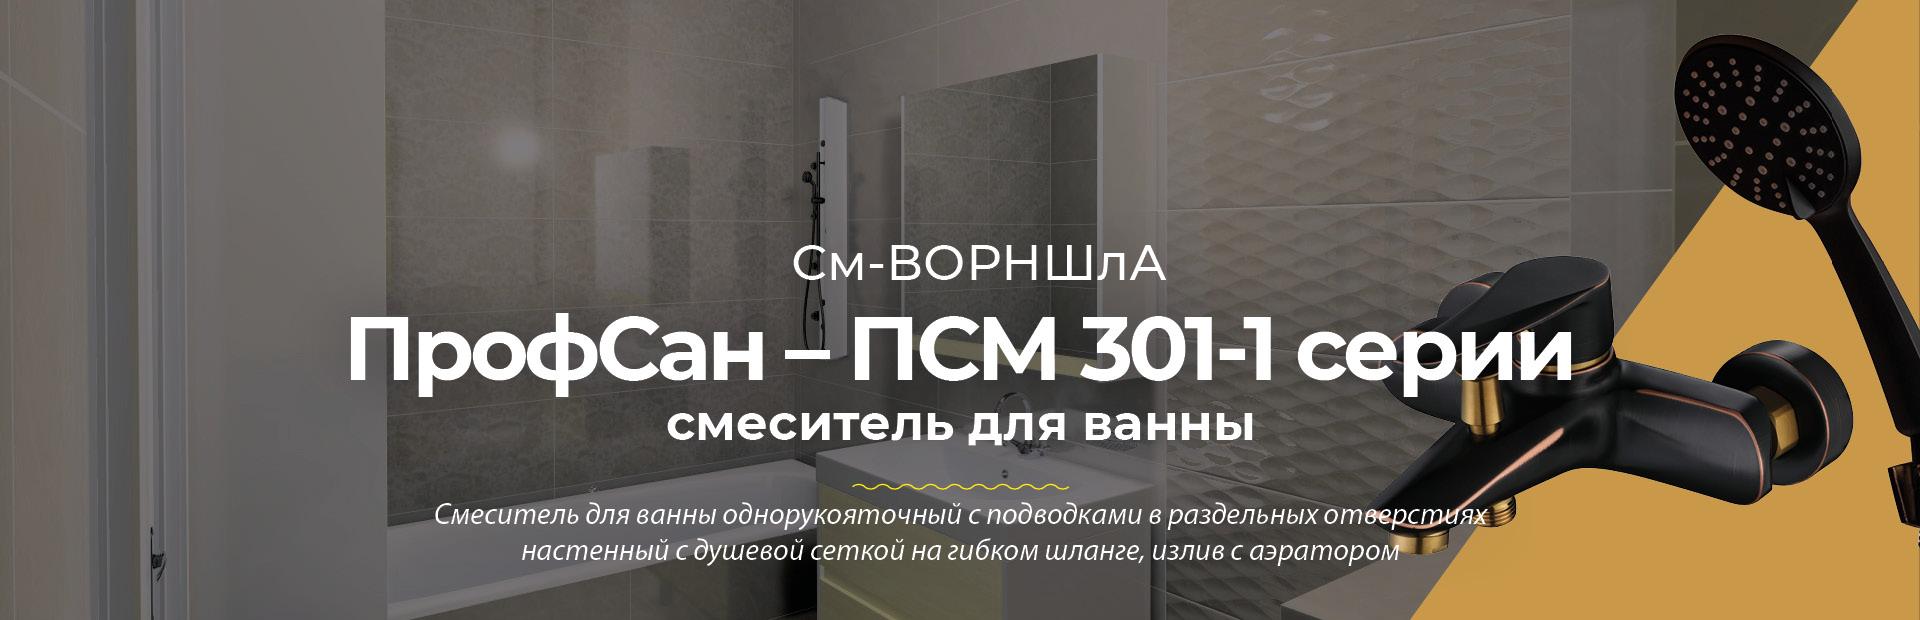 Баннер со смесителем Профсан ПСМ 301-1